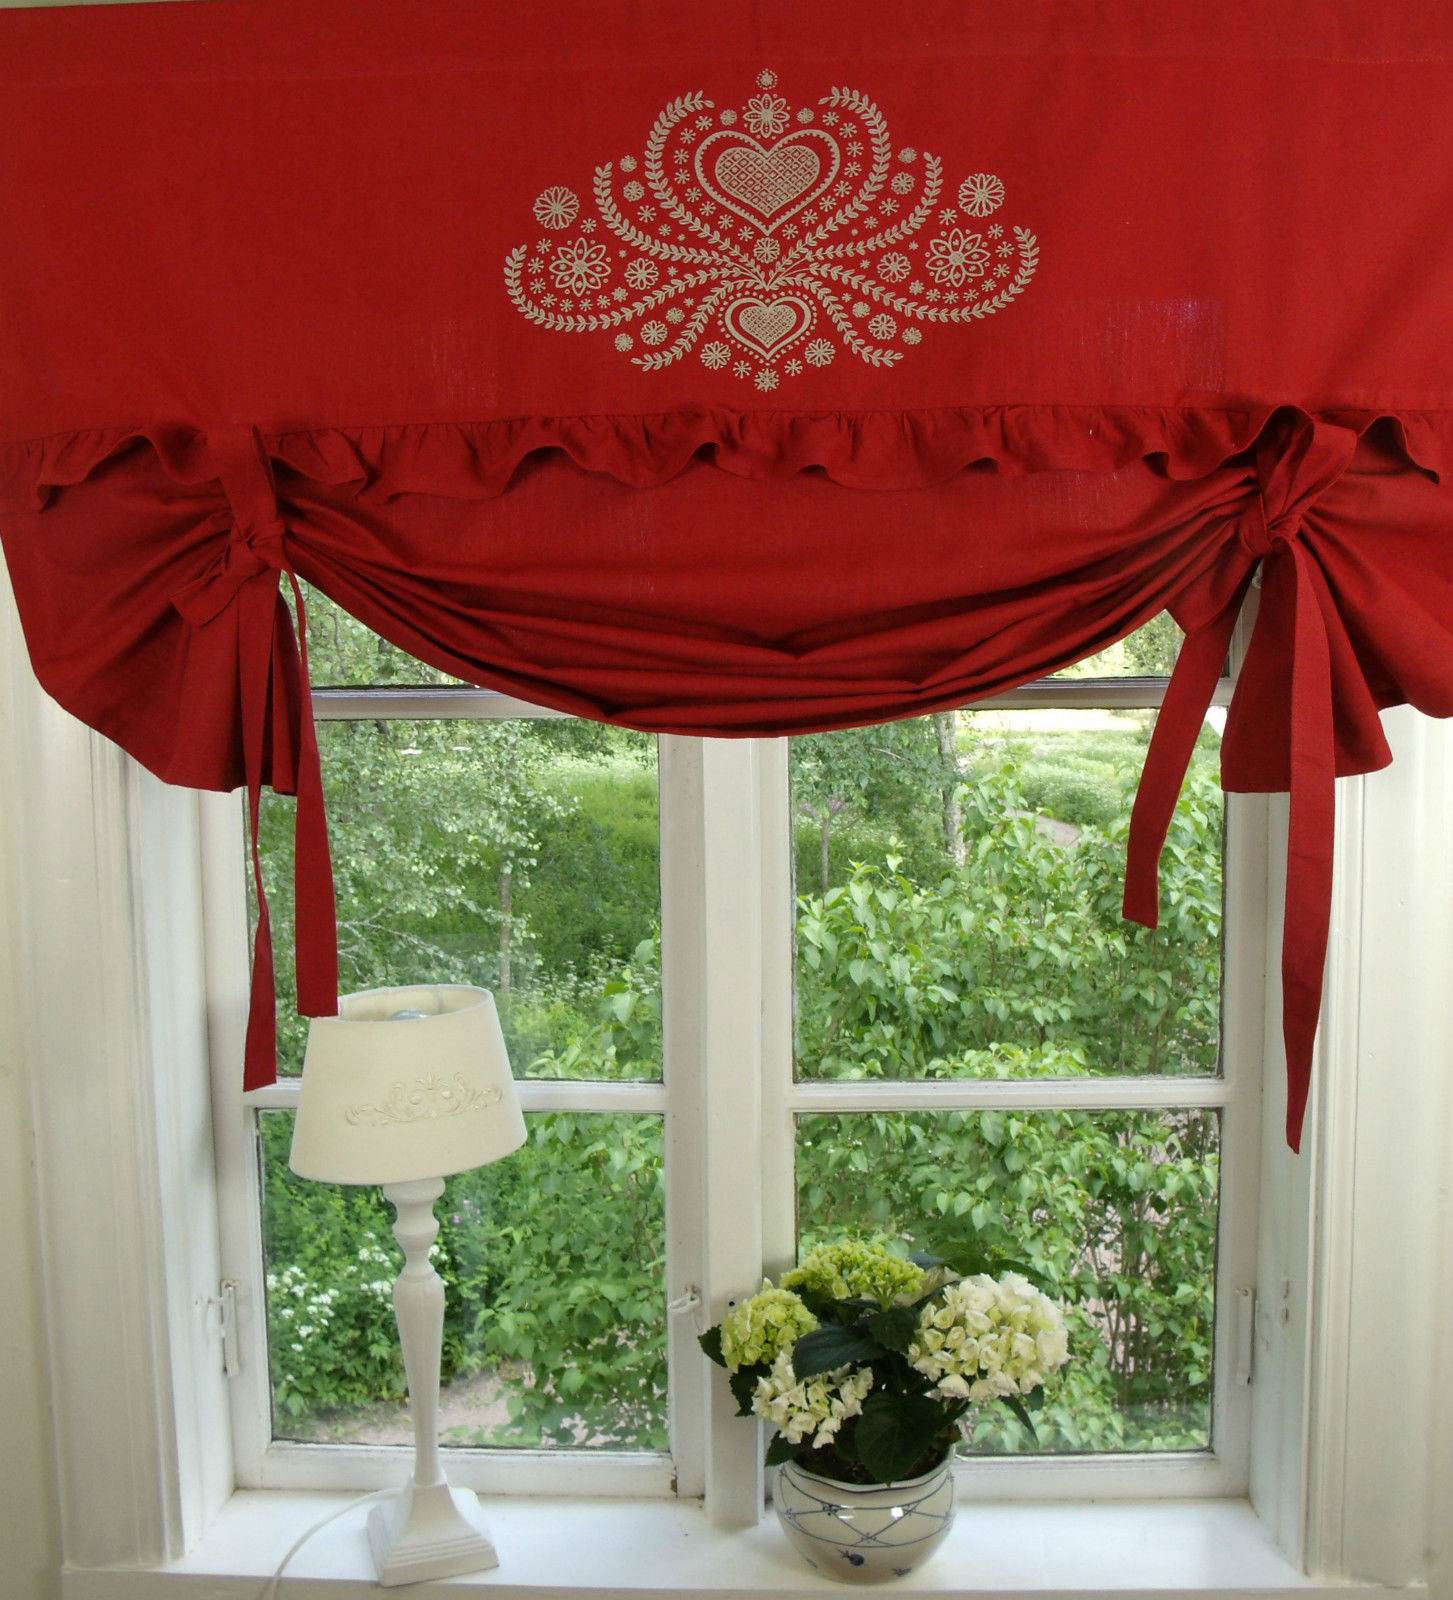 Raff gardine herzig rot rollo 160x100 cm raffgardinen rollos gardinen zauberhafter - Raffgardinen landhausstil ...